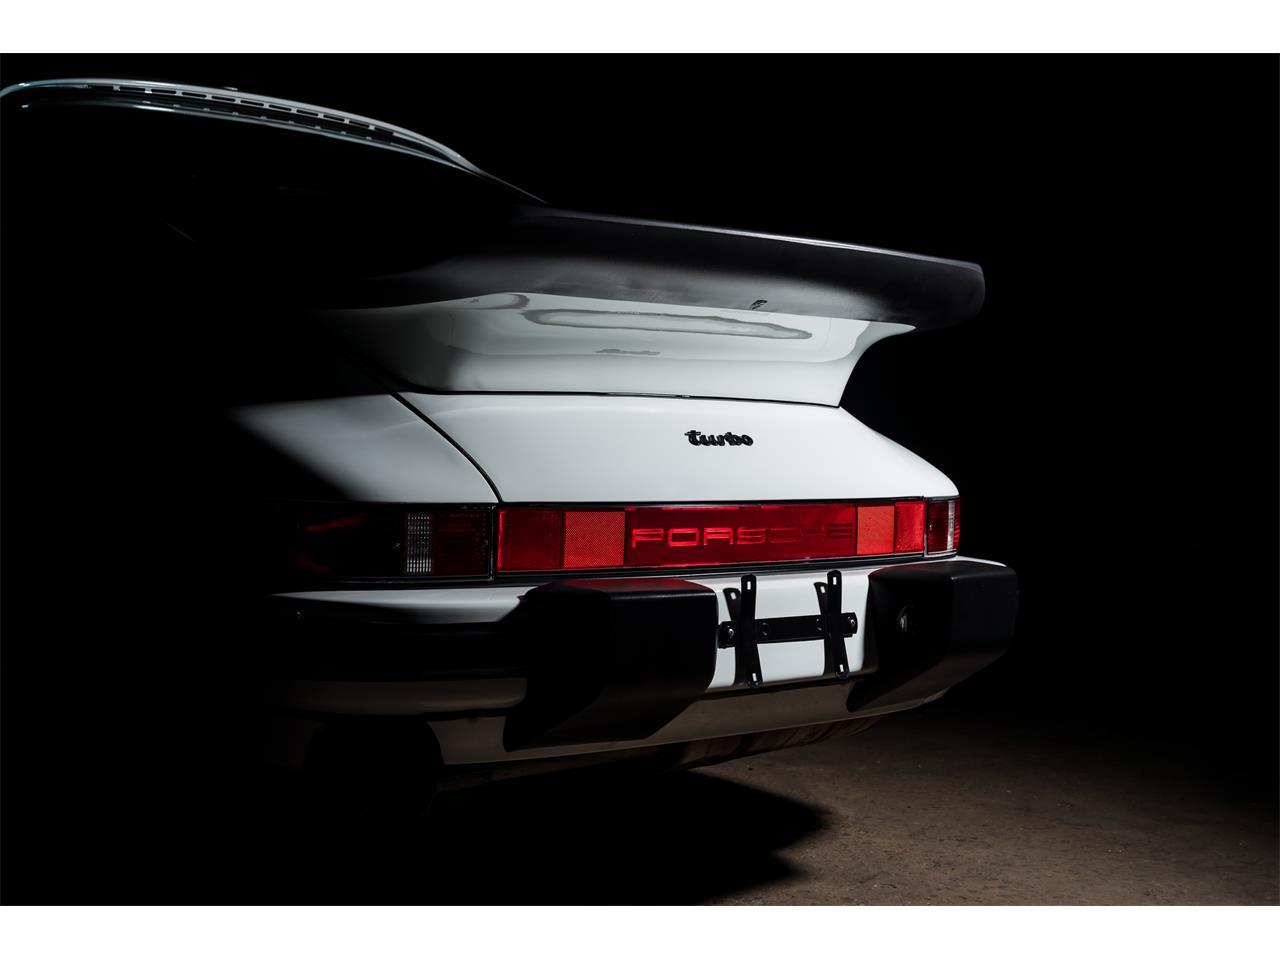 Large Picture of 1989 Porsche 930 Turbo located in Michigan - QXI9